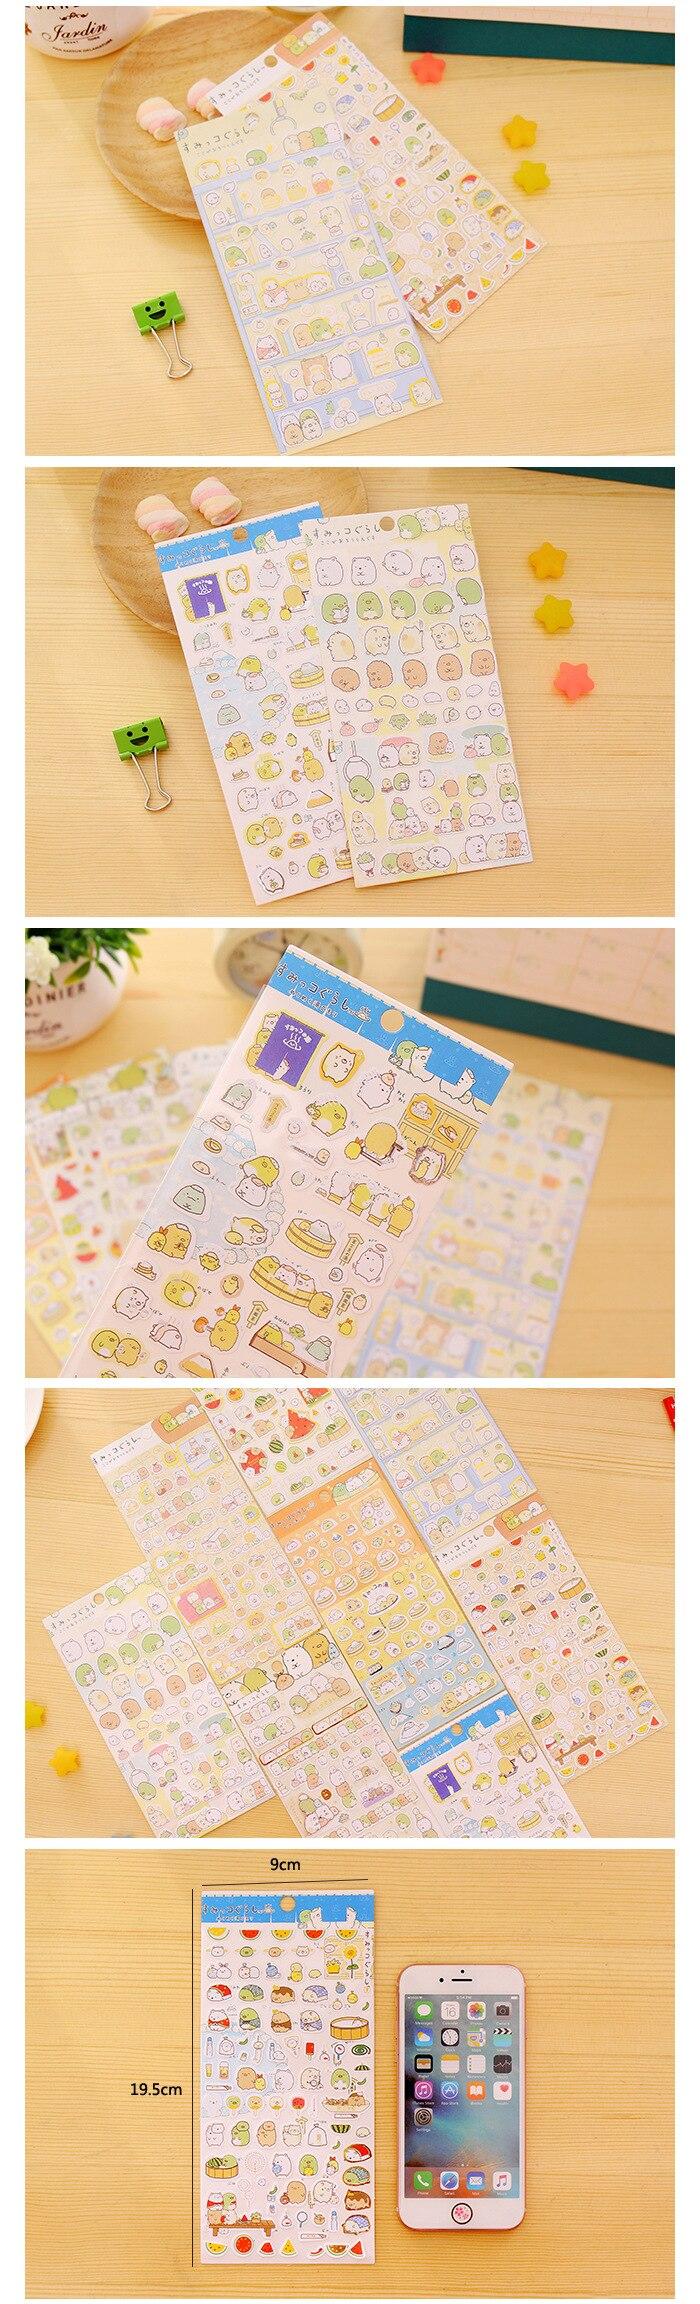 Adesivos criativos coreanos de papelaria, rolo redondo